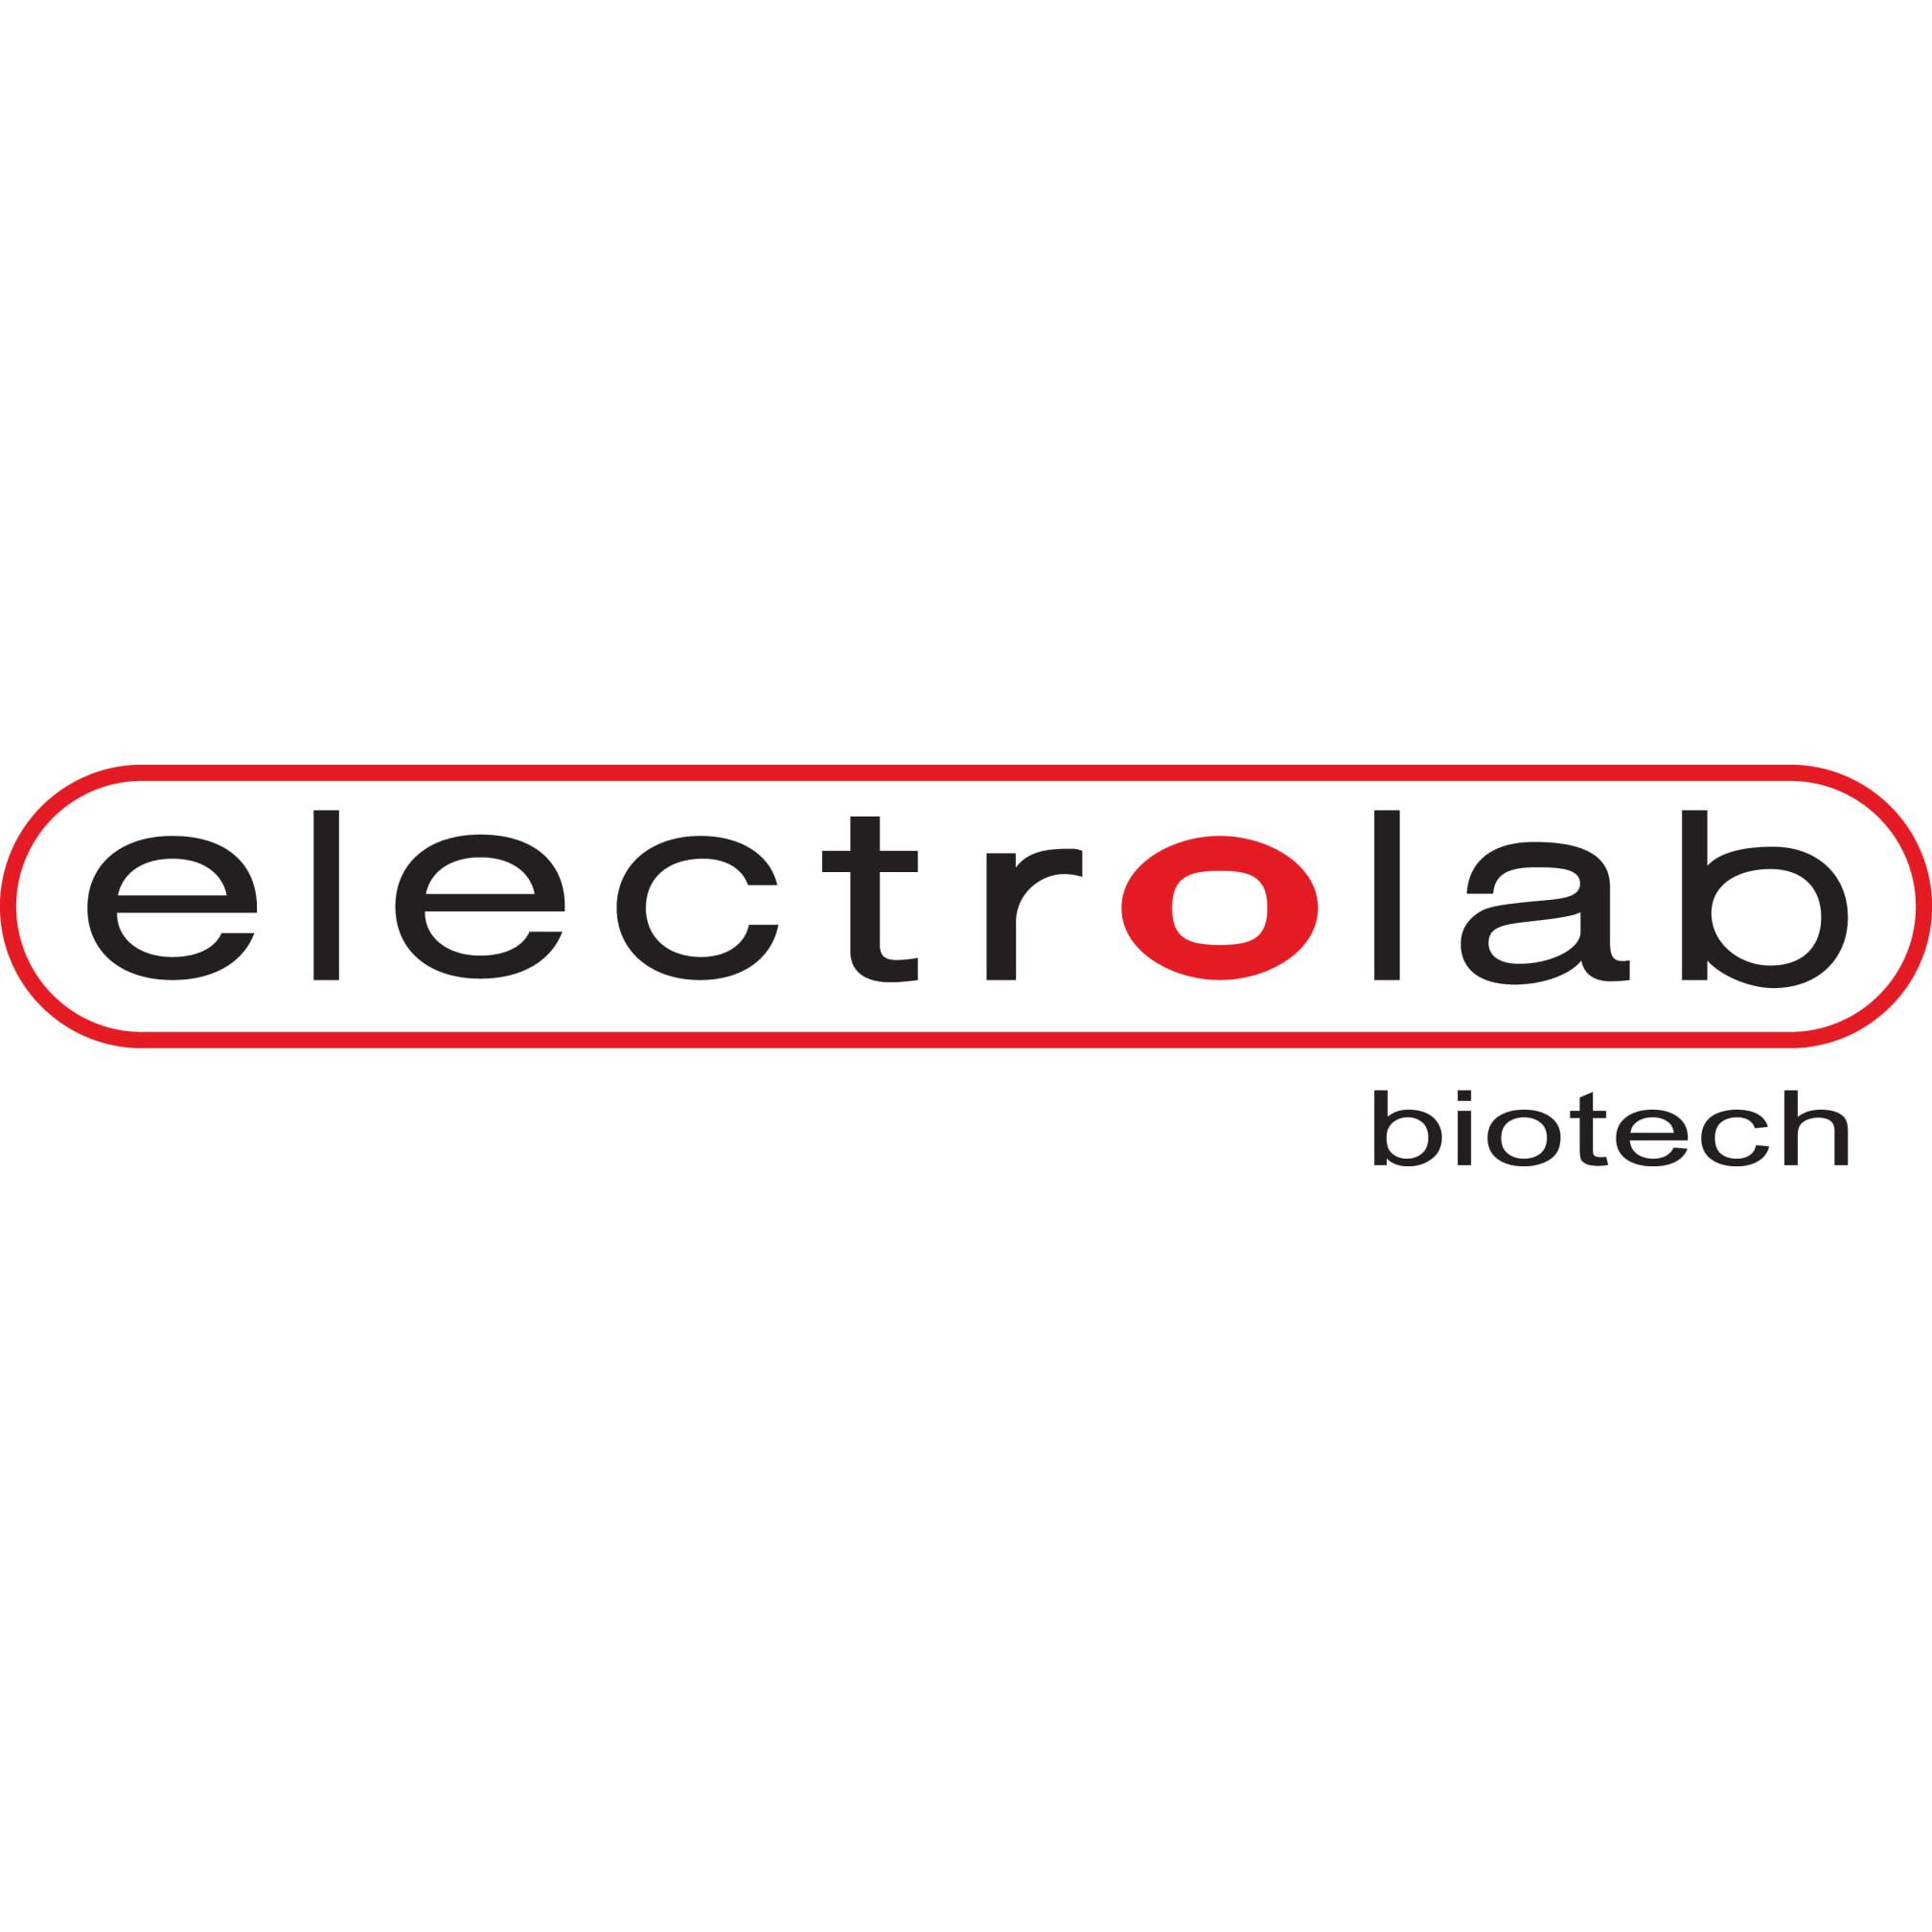 Electrolab Biotech Ltd - Tewkesbury, Gloucestershire GL20 8JH - 01684 291007 | ShowMeLocal.com